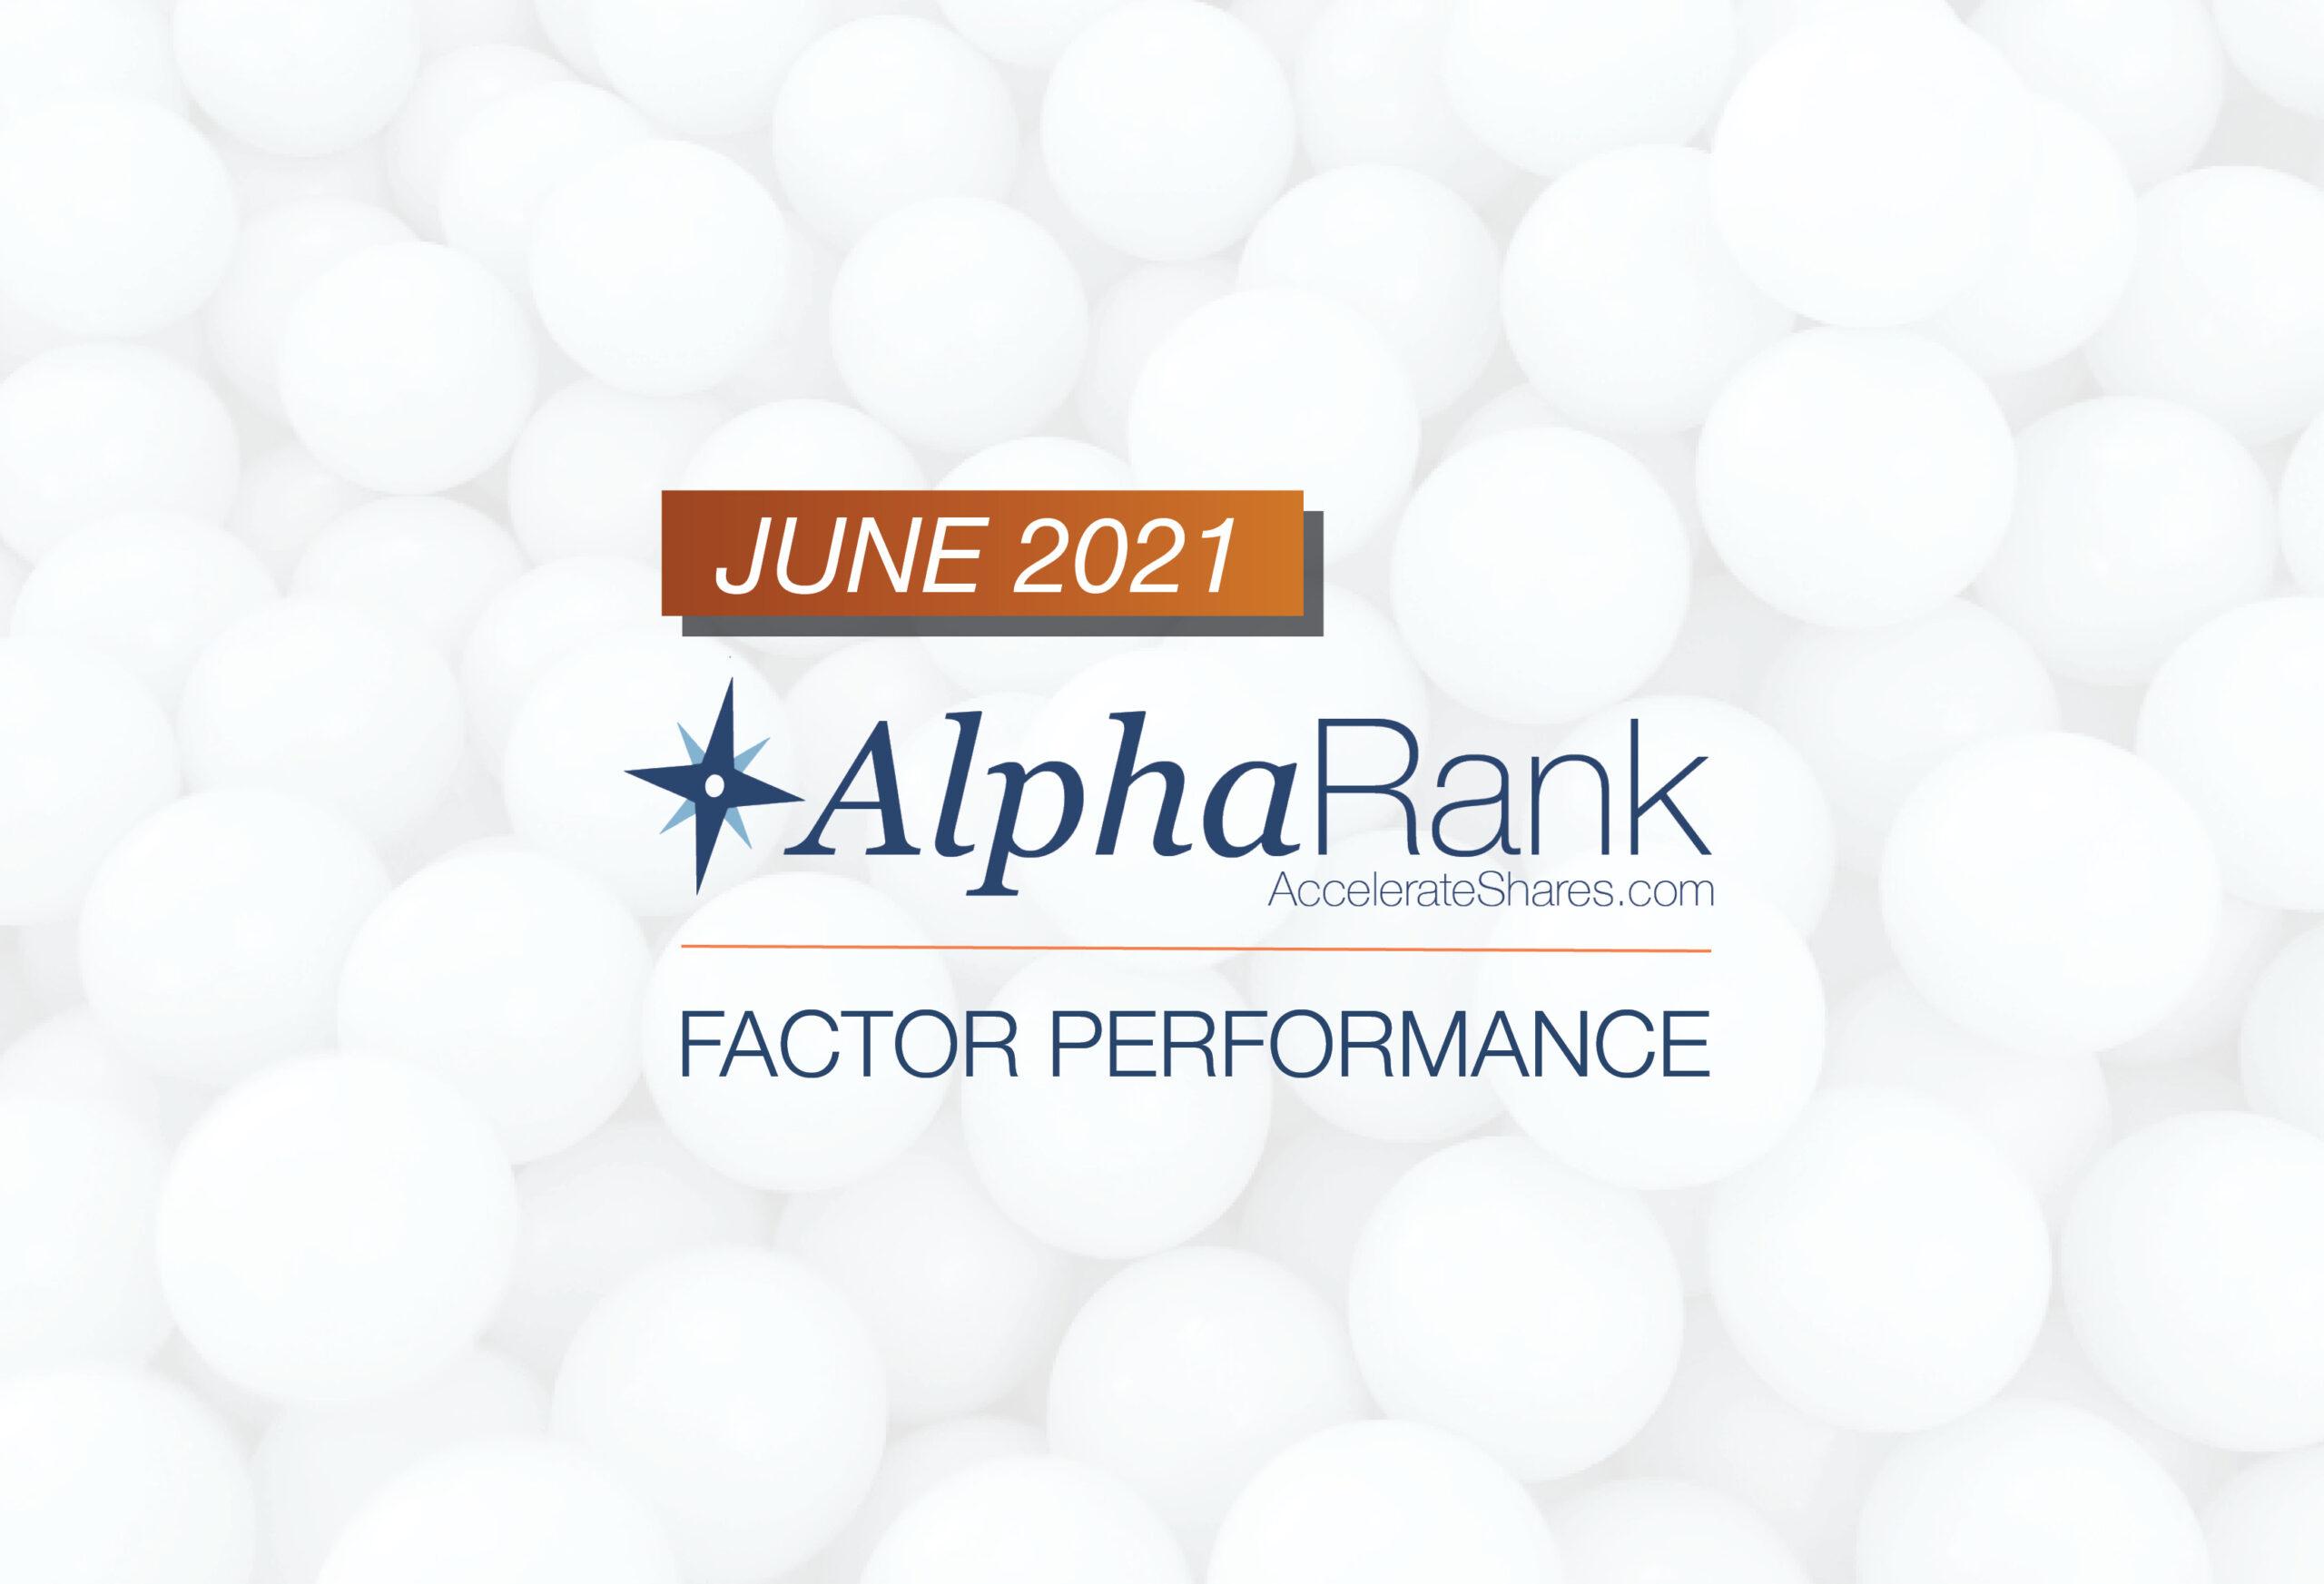 AlphaRank Factor Performance- June 2021